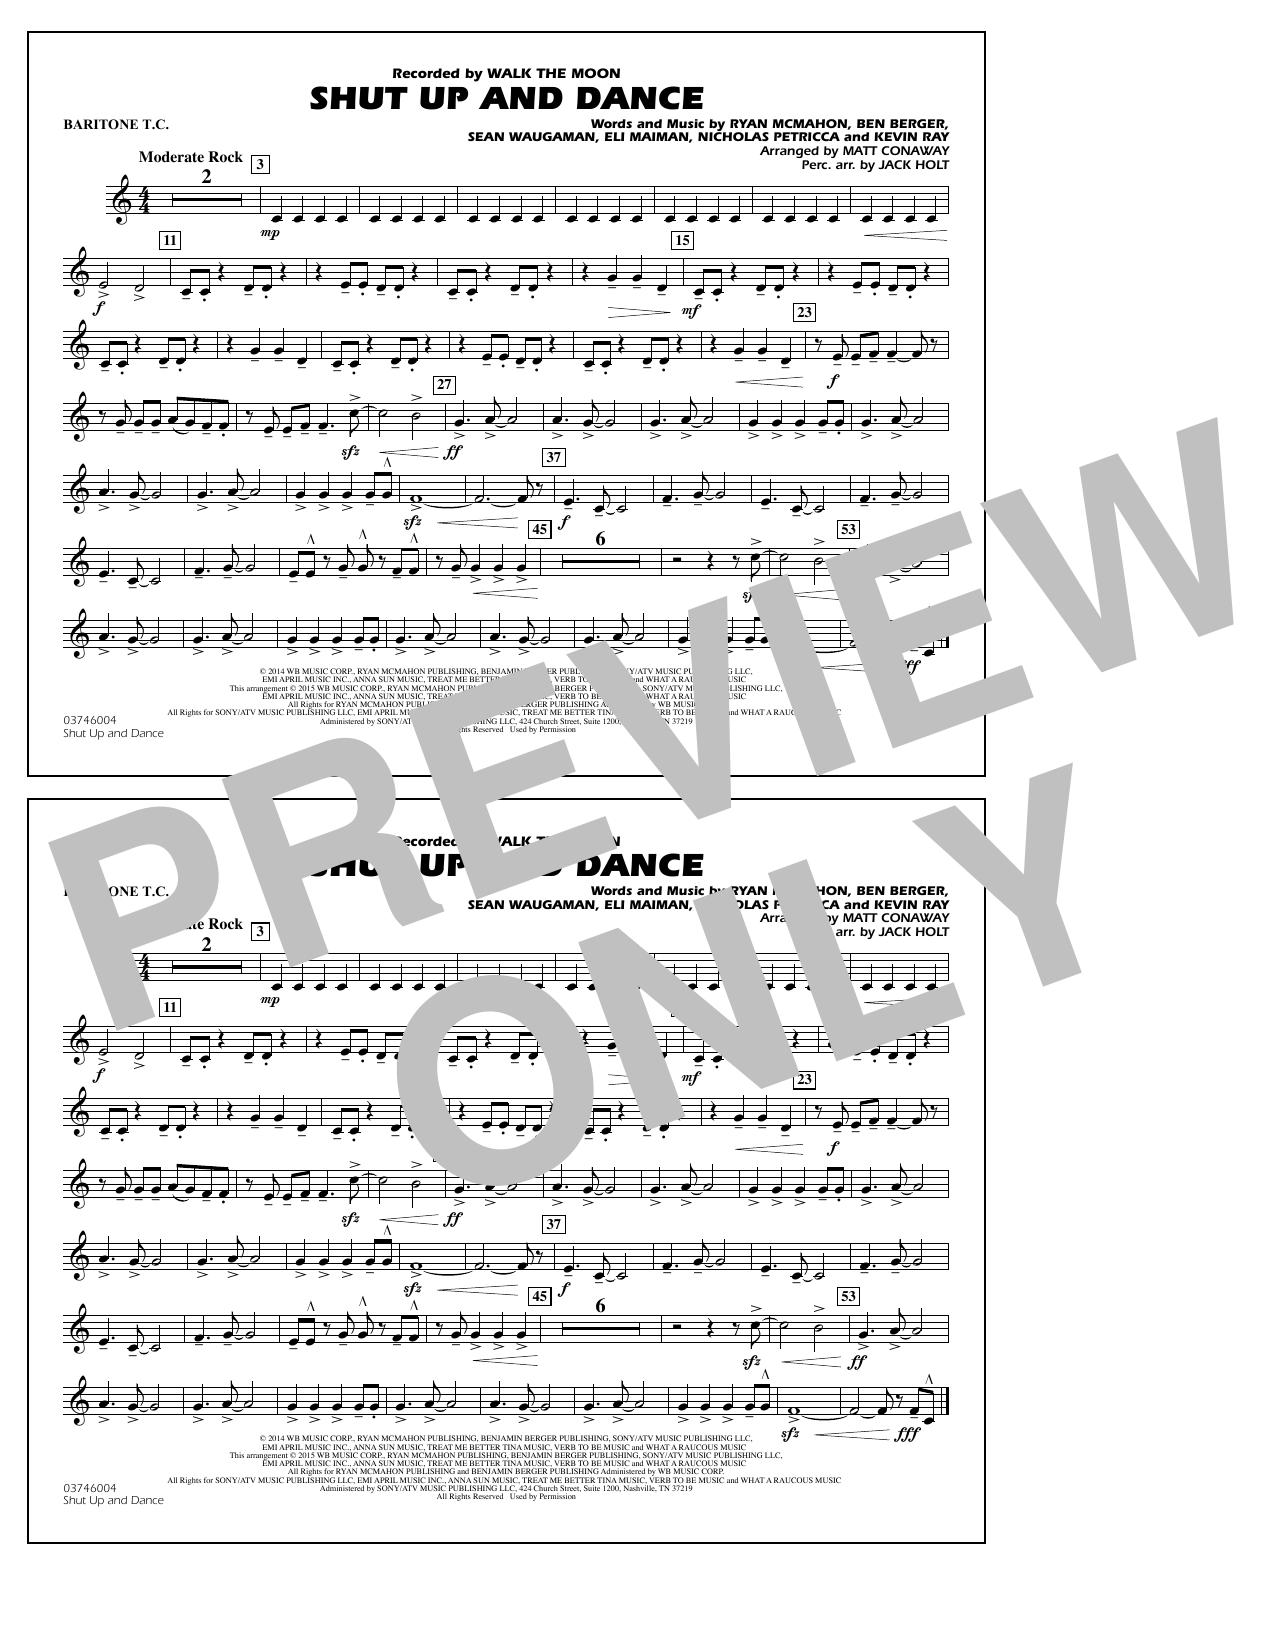 Walk The Moon Shut Up and Dance (Arr. Matt Conaway) - Baritone T.C. sheet music notes and chords